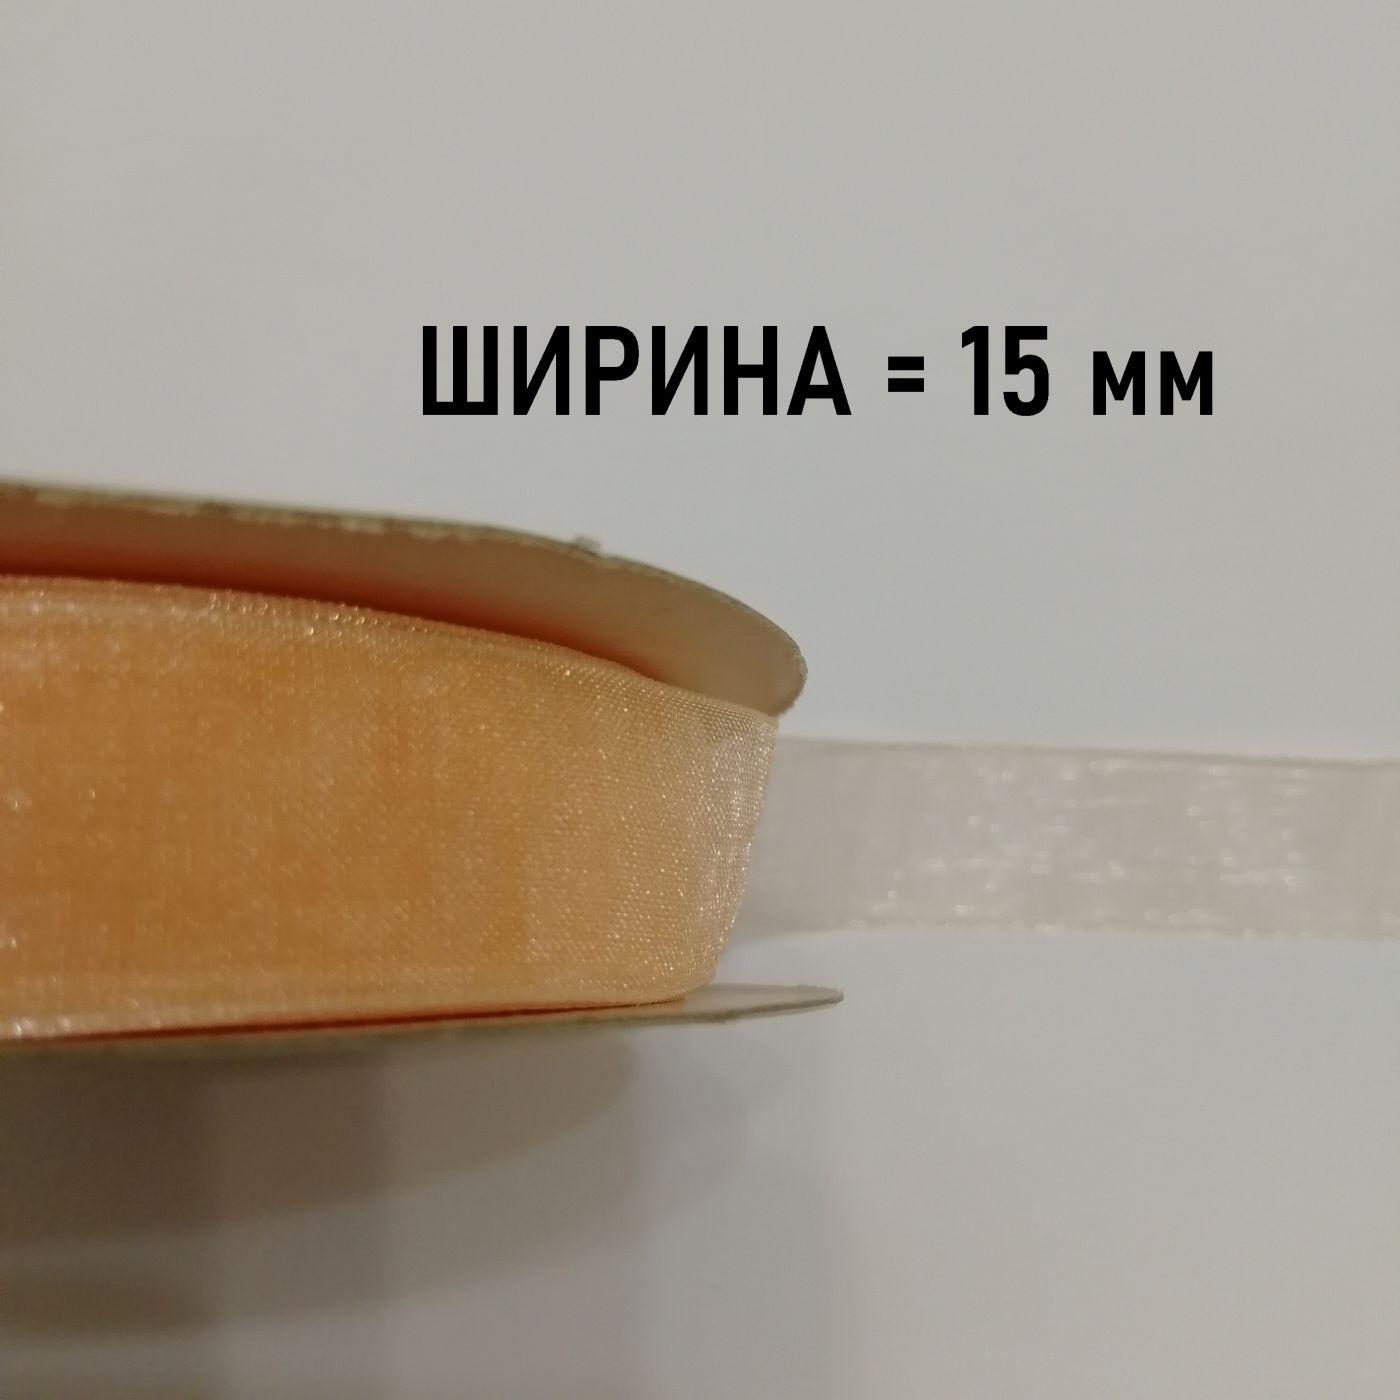 Лента органза Кремоваяя Идеал ширина - 15 мм